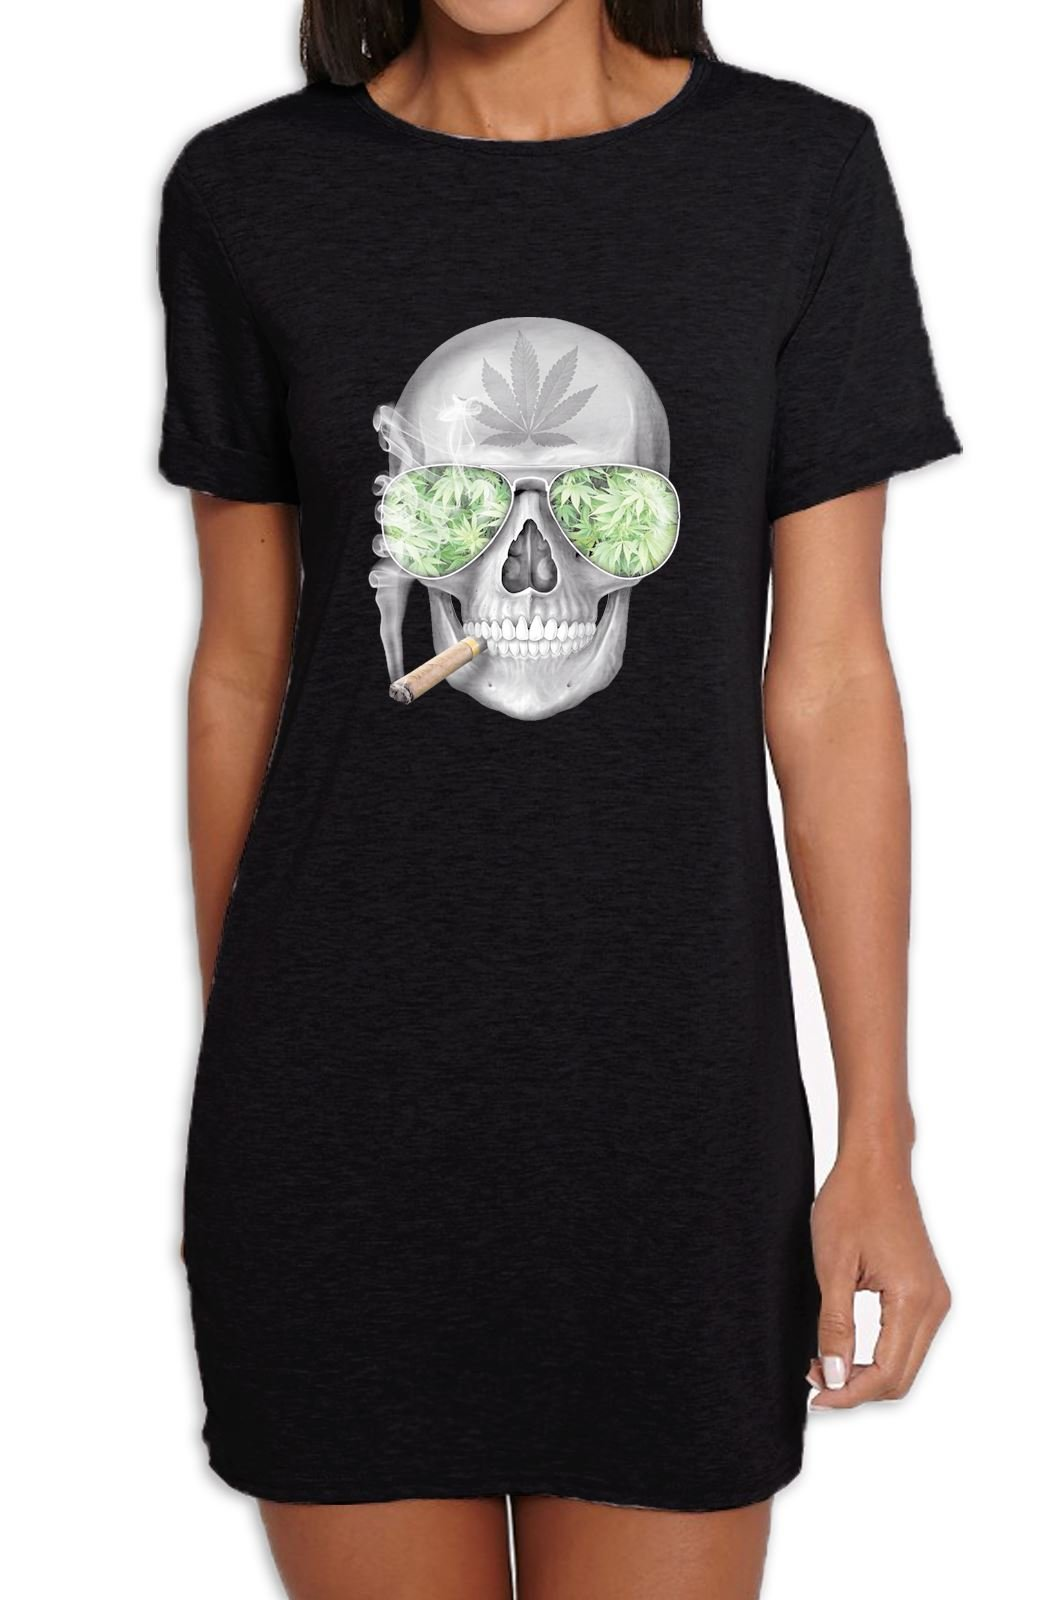 Tribal T-Shirts Skull Smoking Cannabis Women's T-Shirt Dress